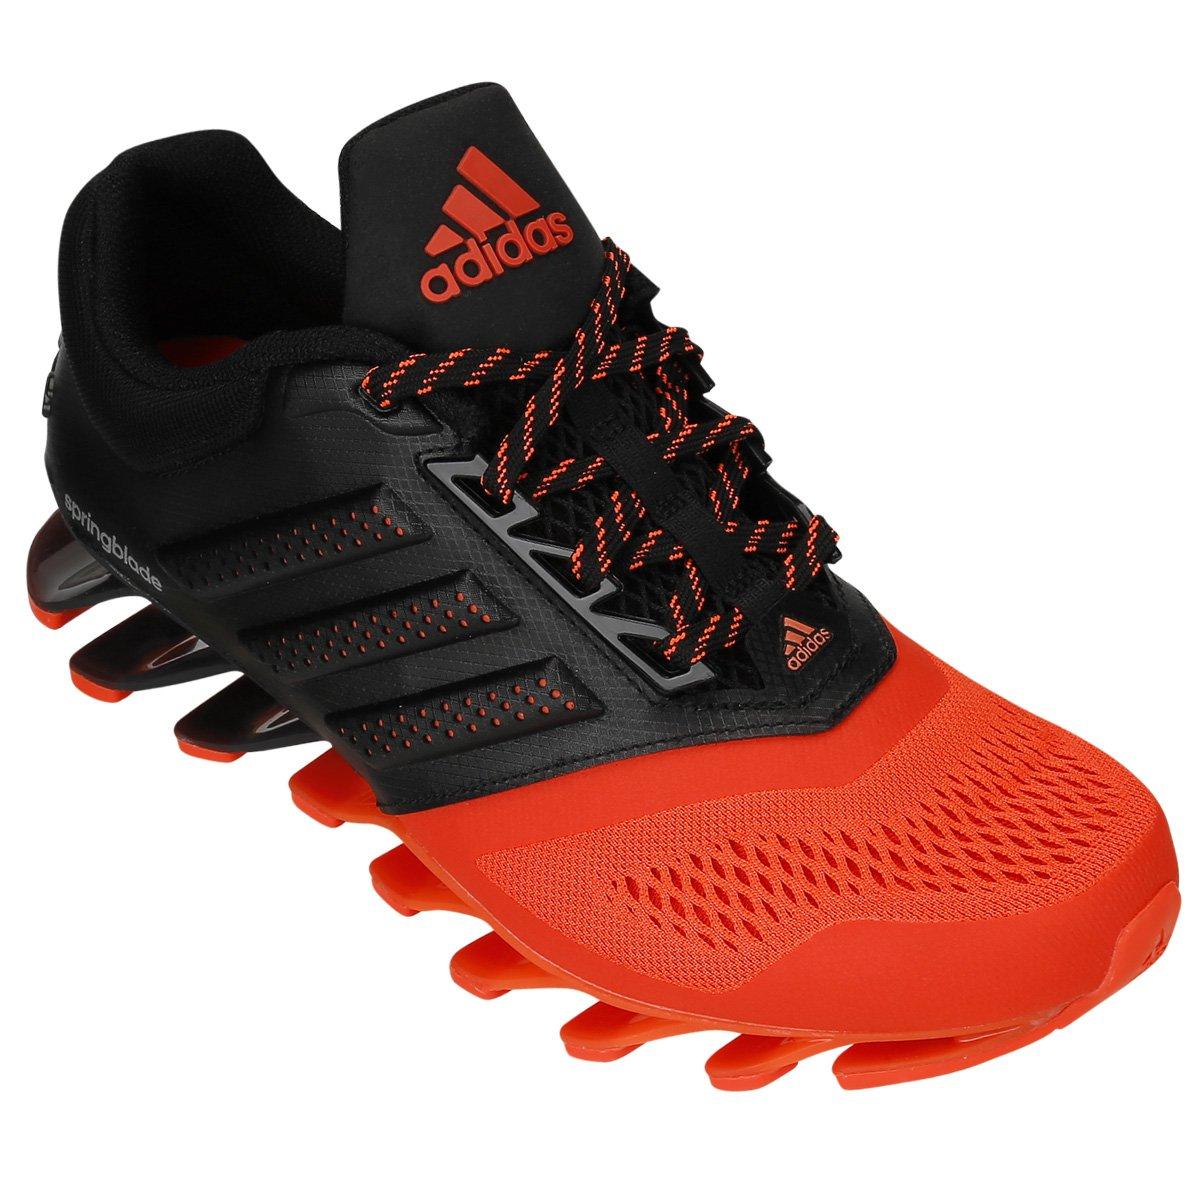 7aa915d3775 ... where can i buy tênis adidas springblade 2 juvenil compre agora  netshoes 7db4b 76184